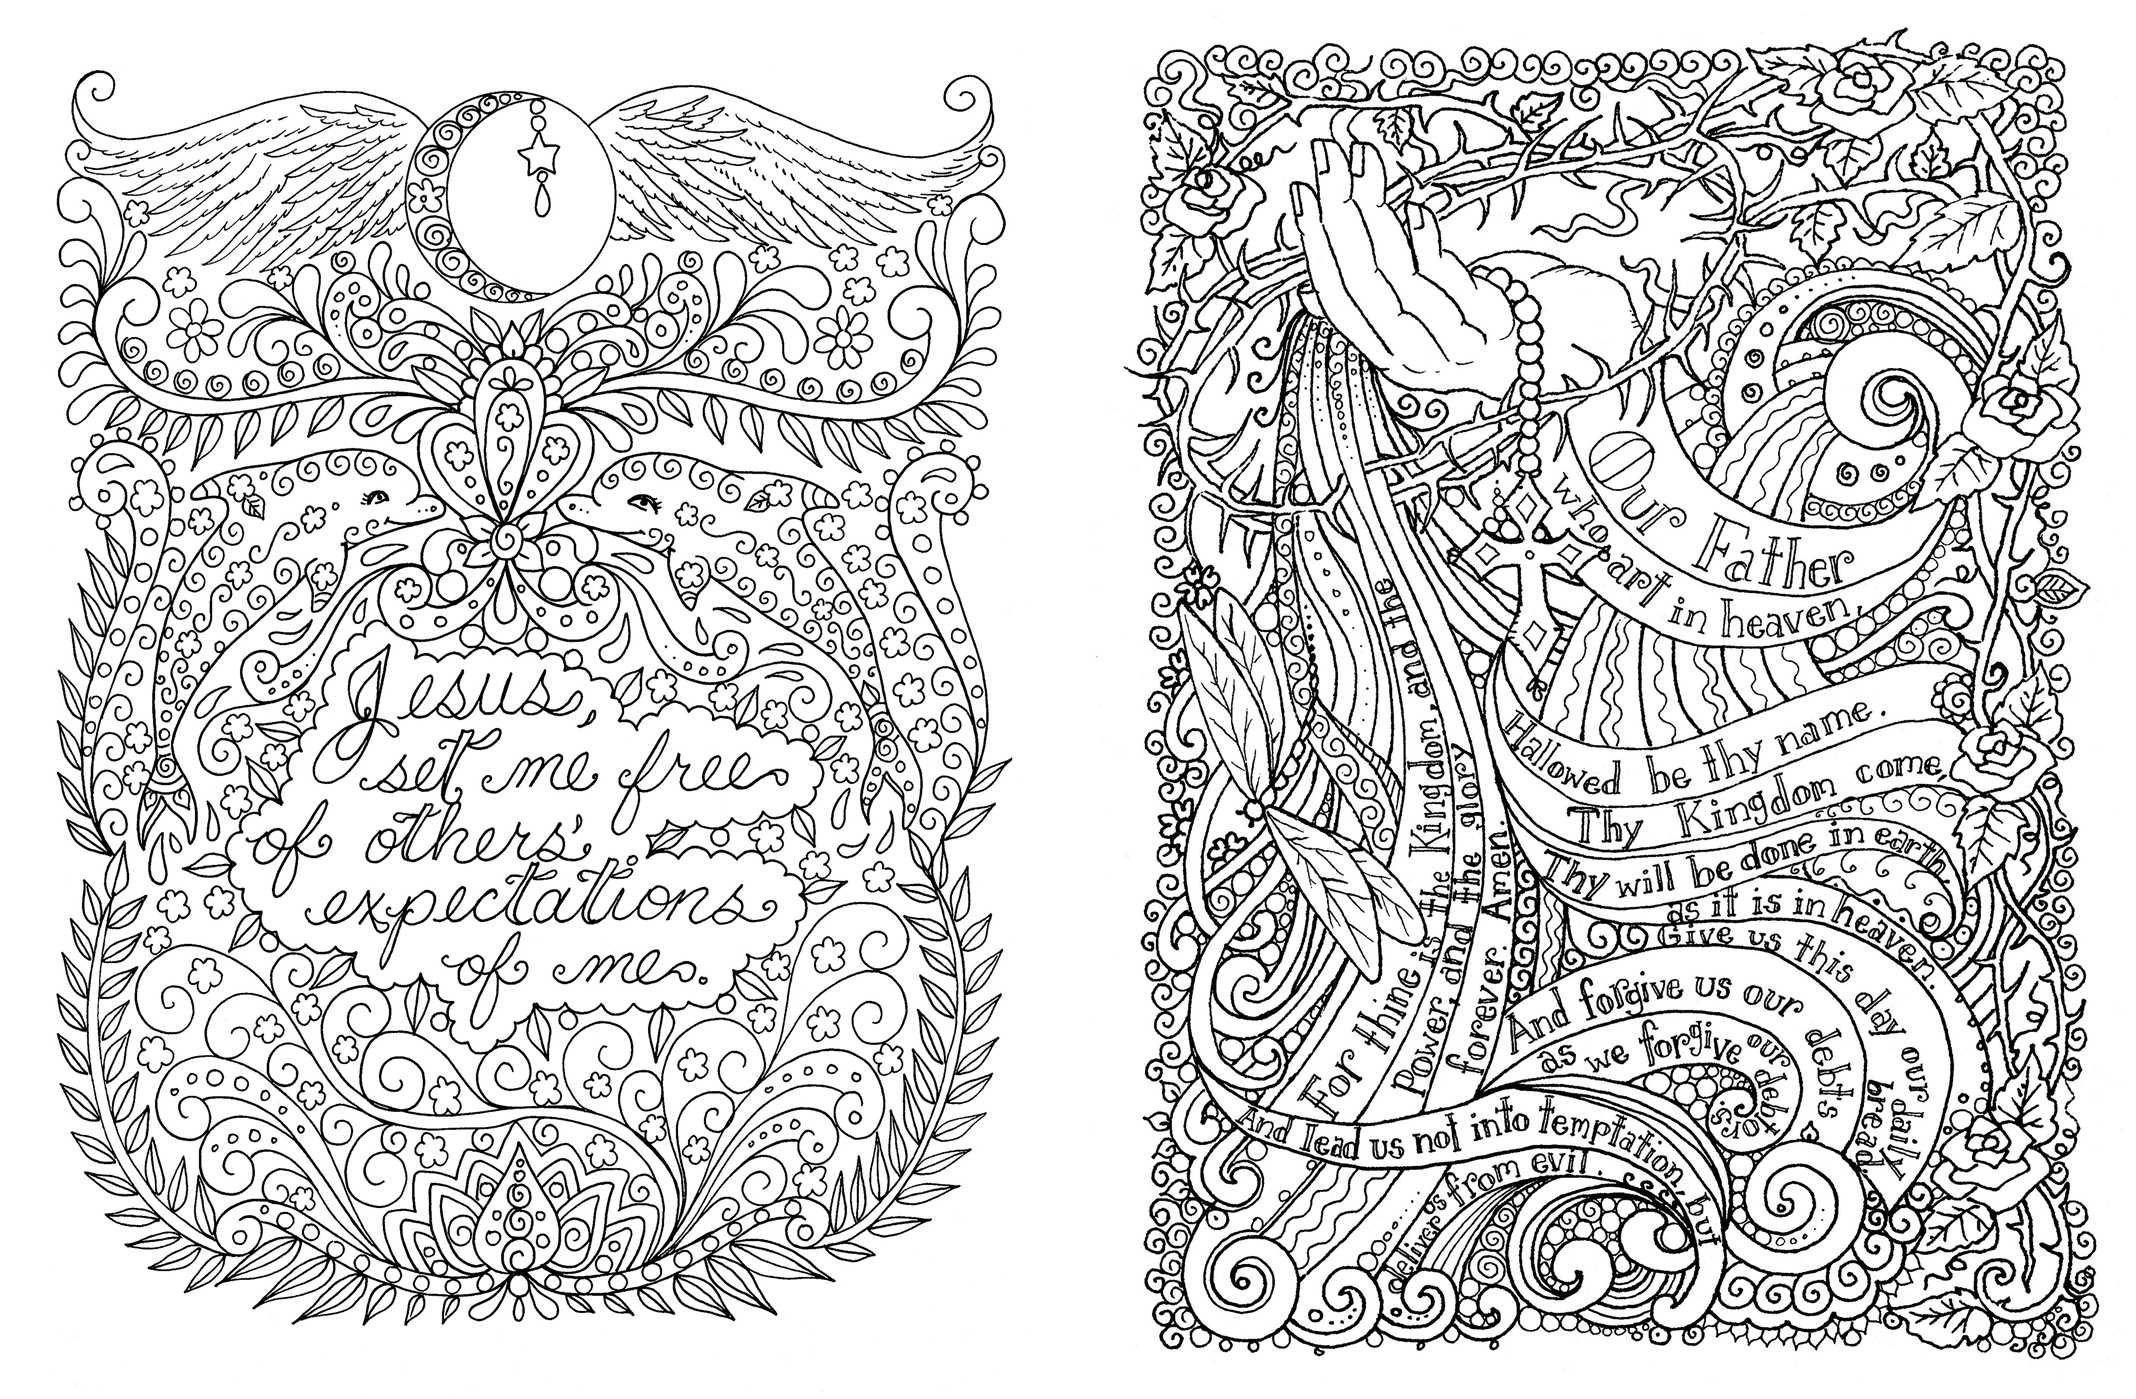 Posh Adult Coloring Book Prayers for Inspiration & Peace Posh